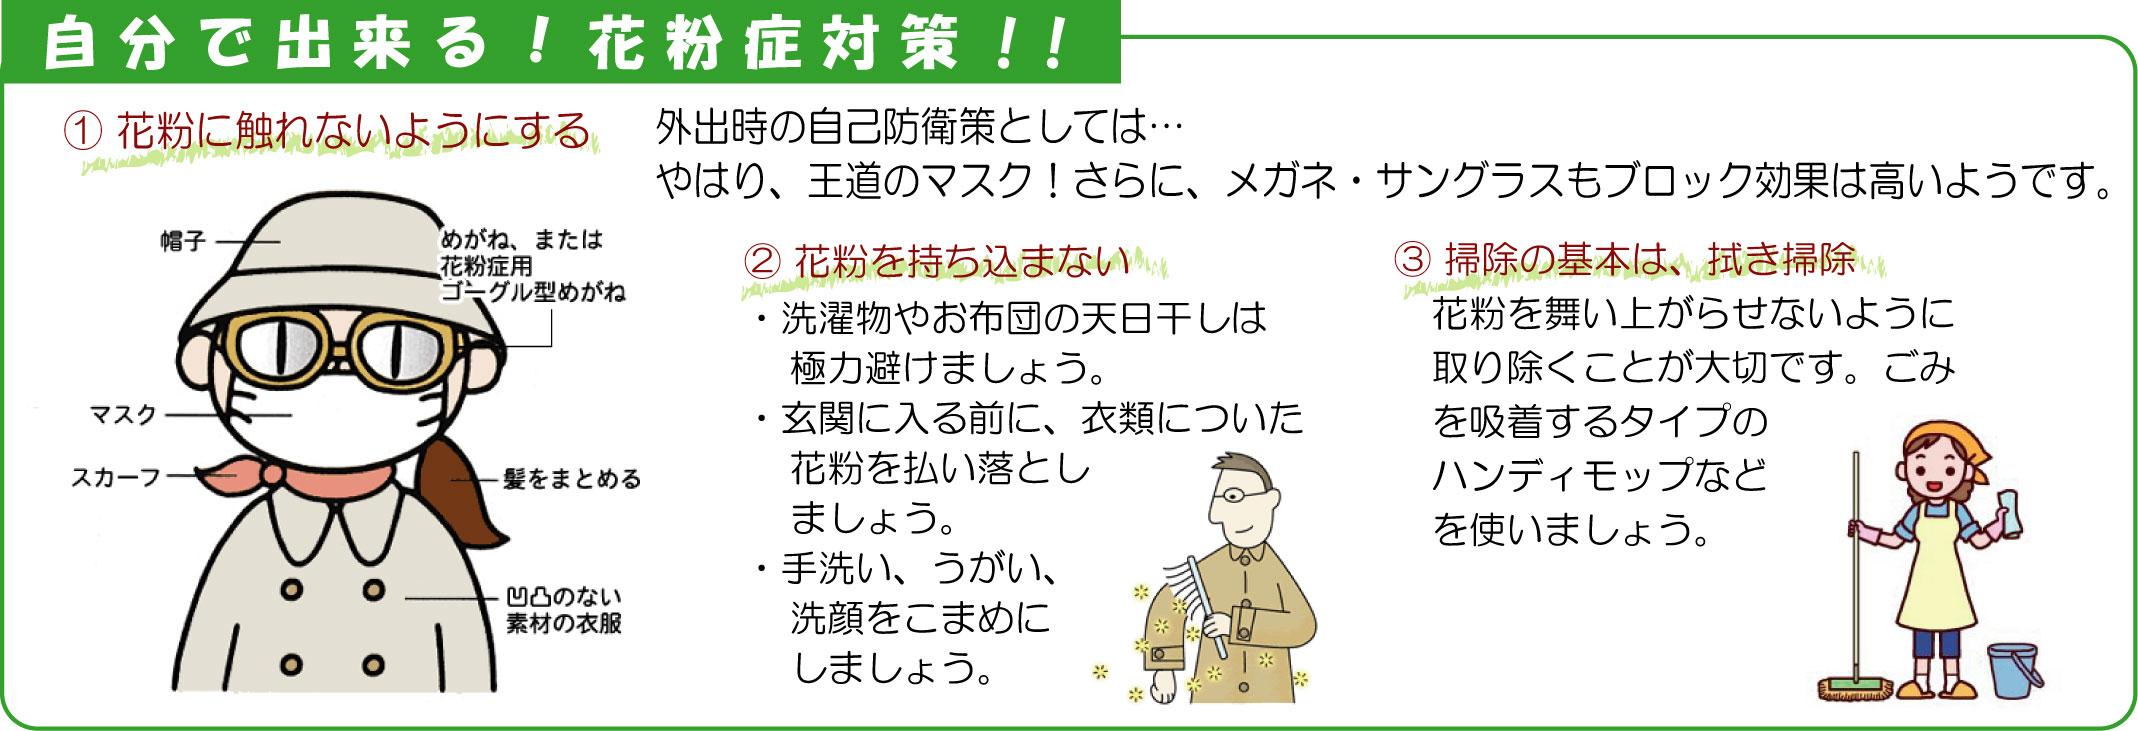 KuraSi-natu-sin69-12.jpg